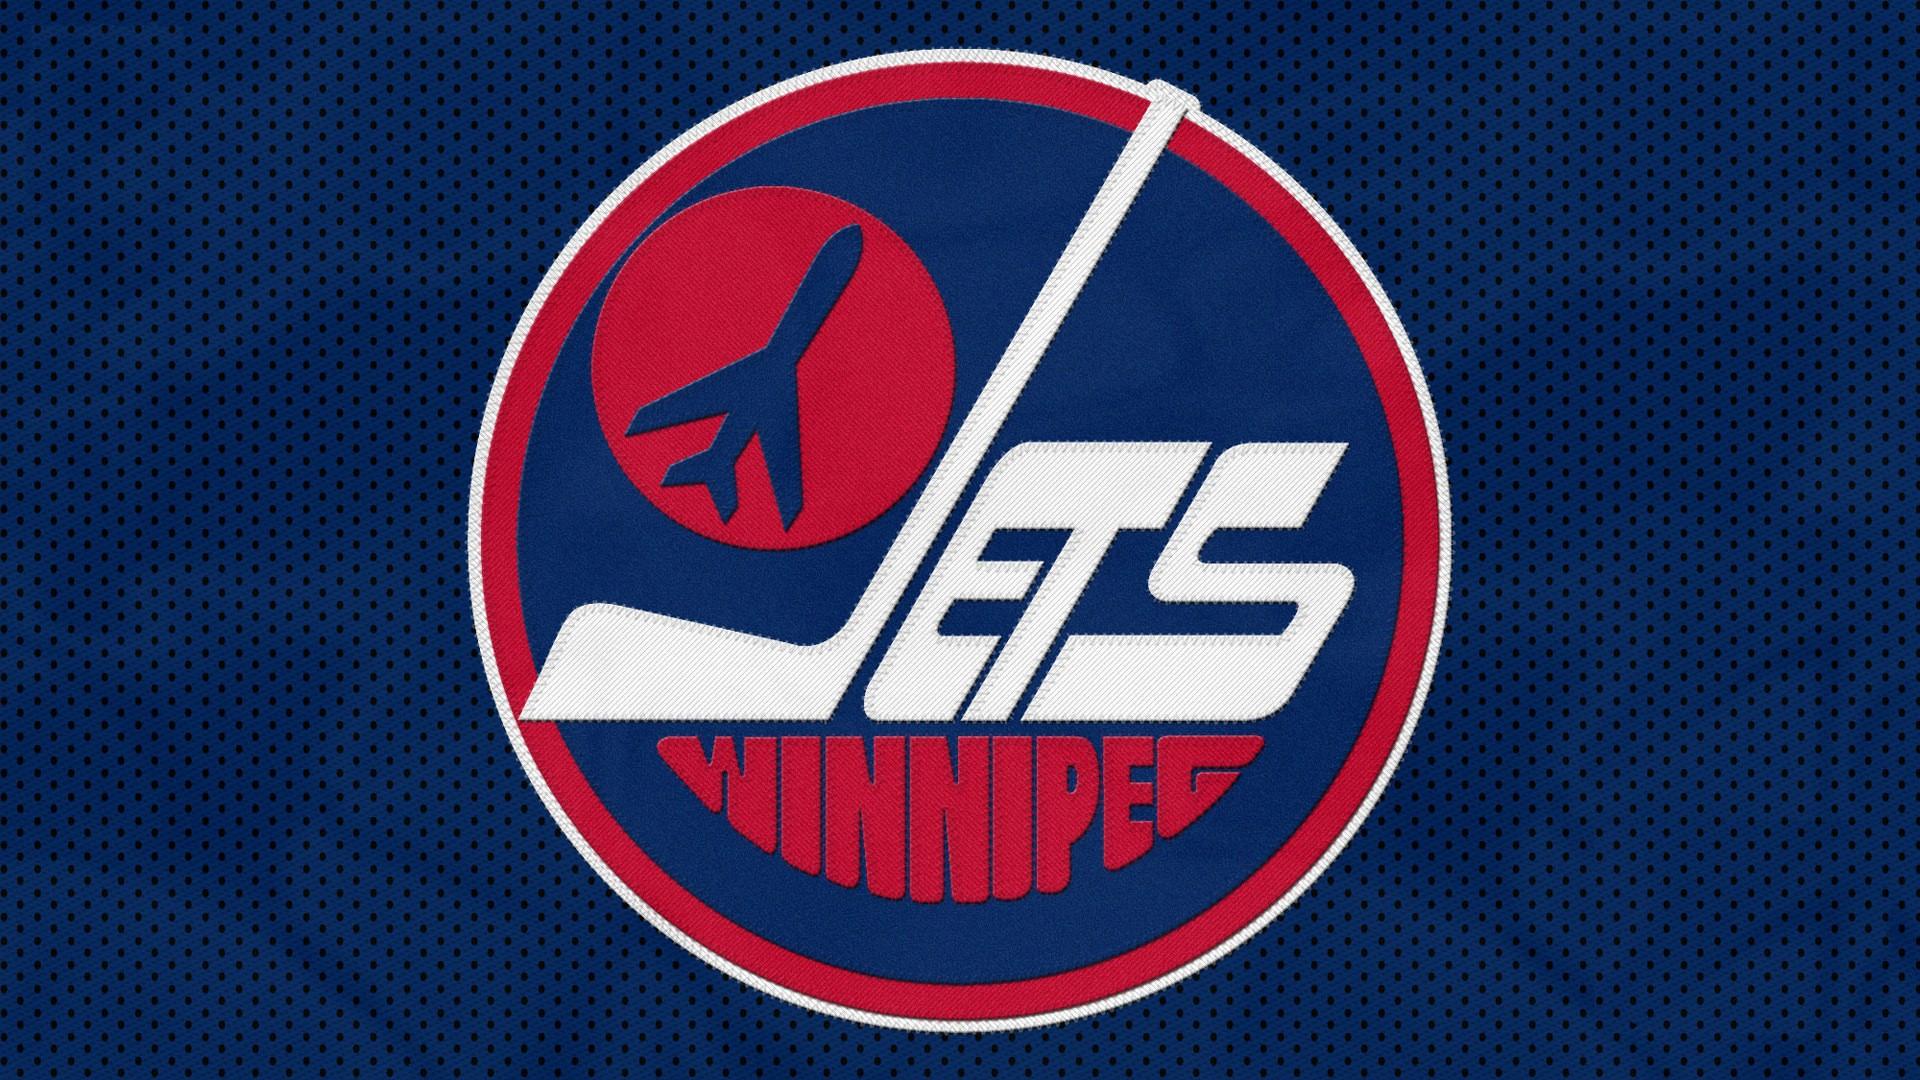 Winnipeg Jets Wallpaper 3   1920 X 1080 stmednet 1920x1080